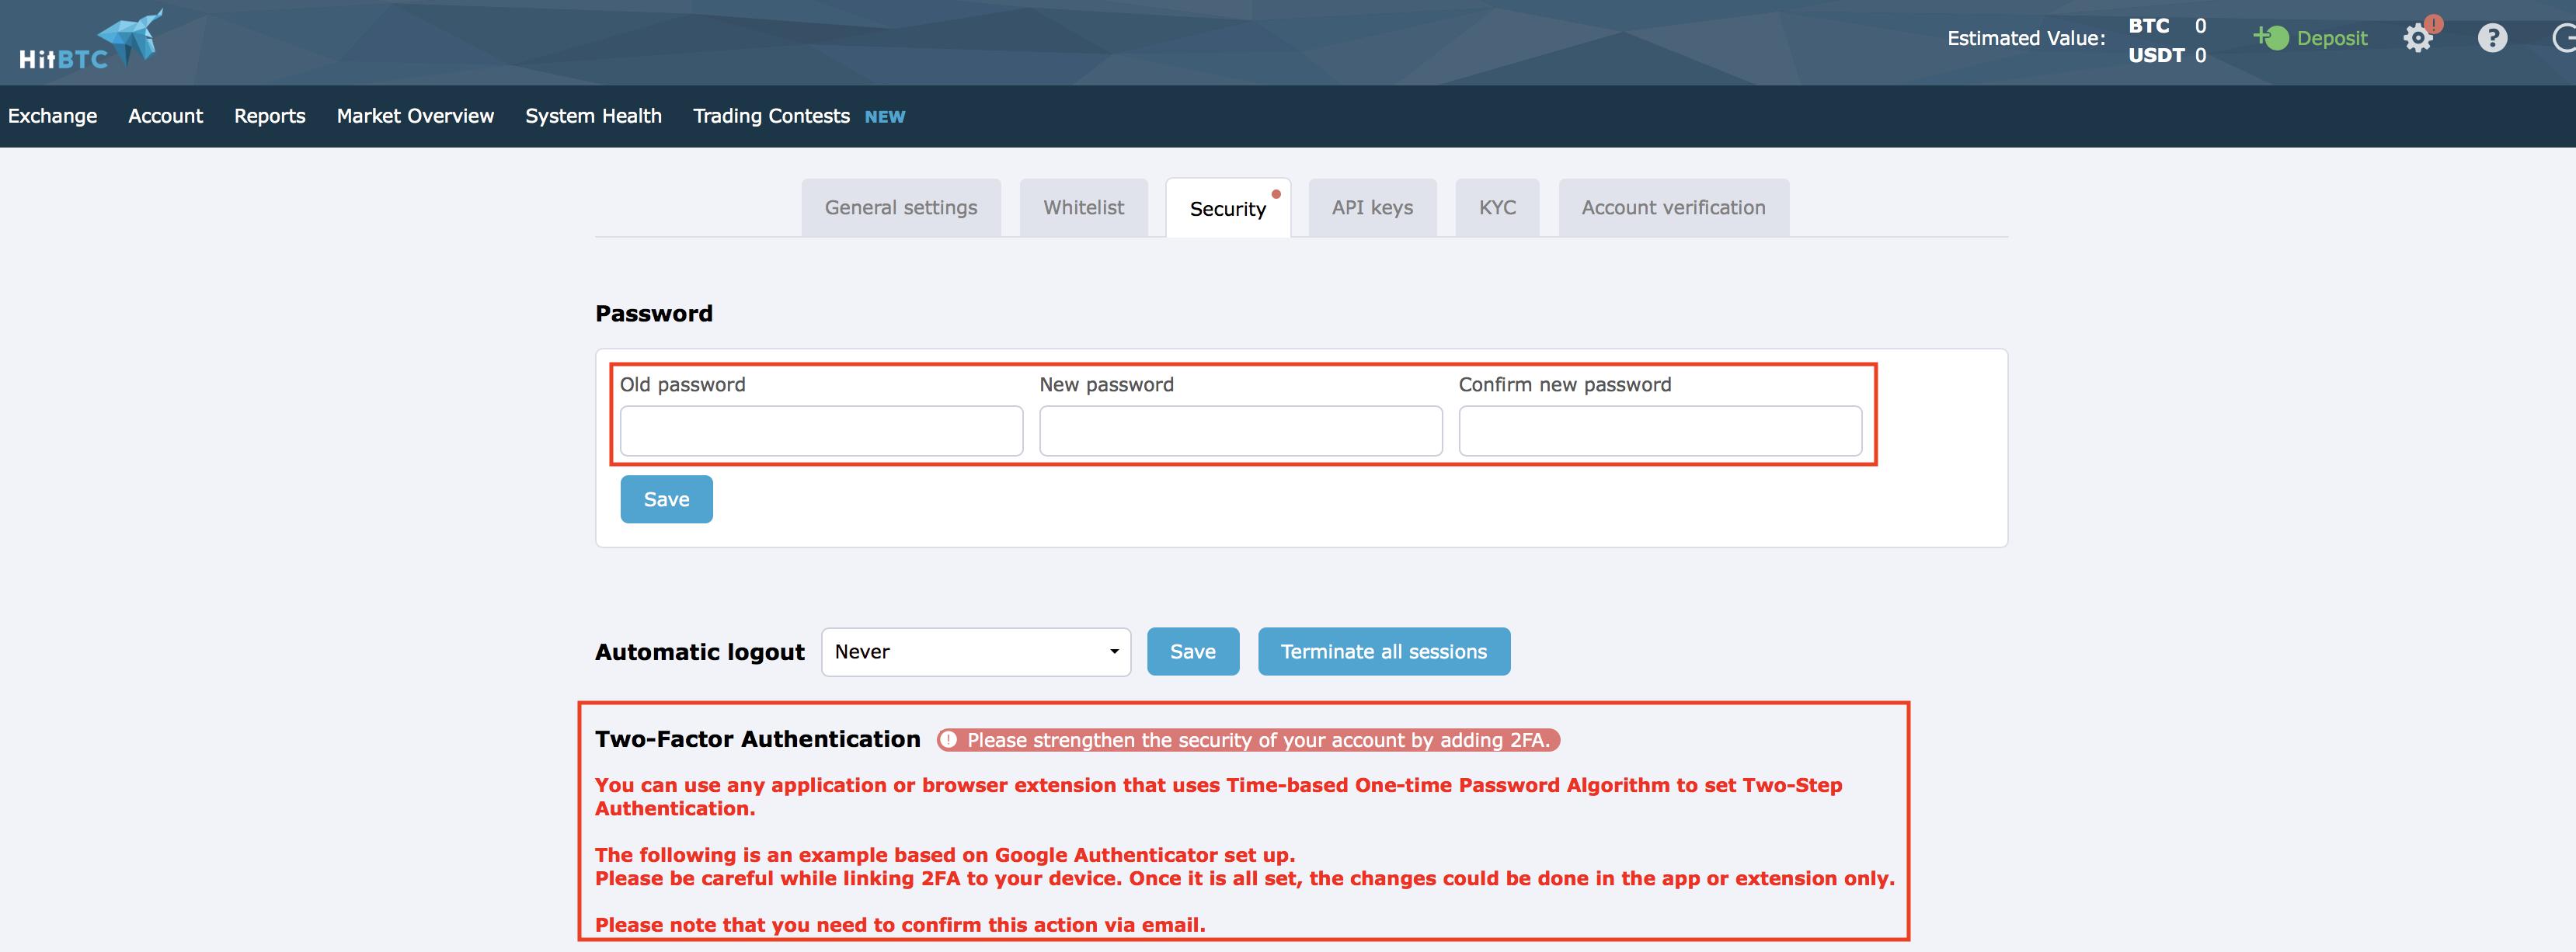 HitBTC 2 factor authentication